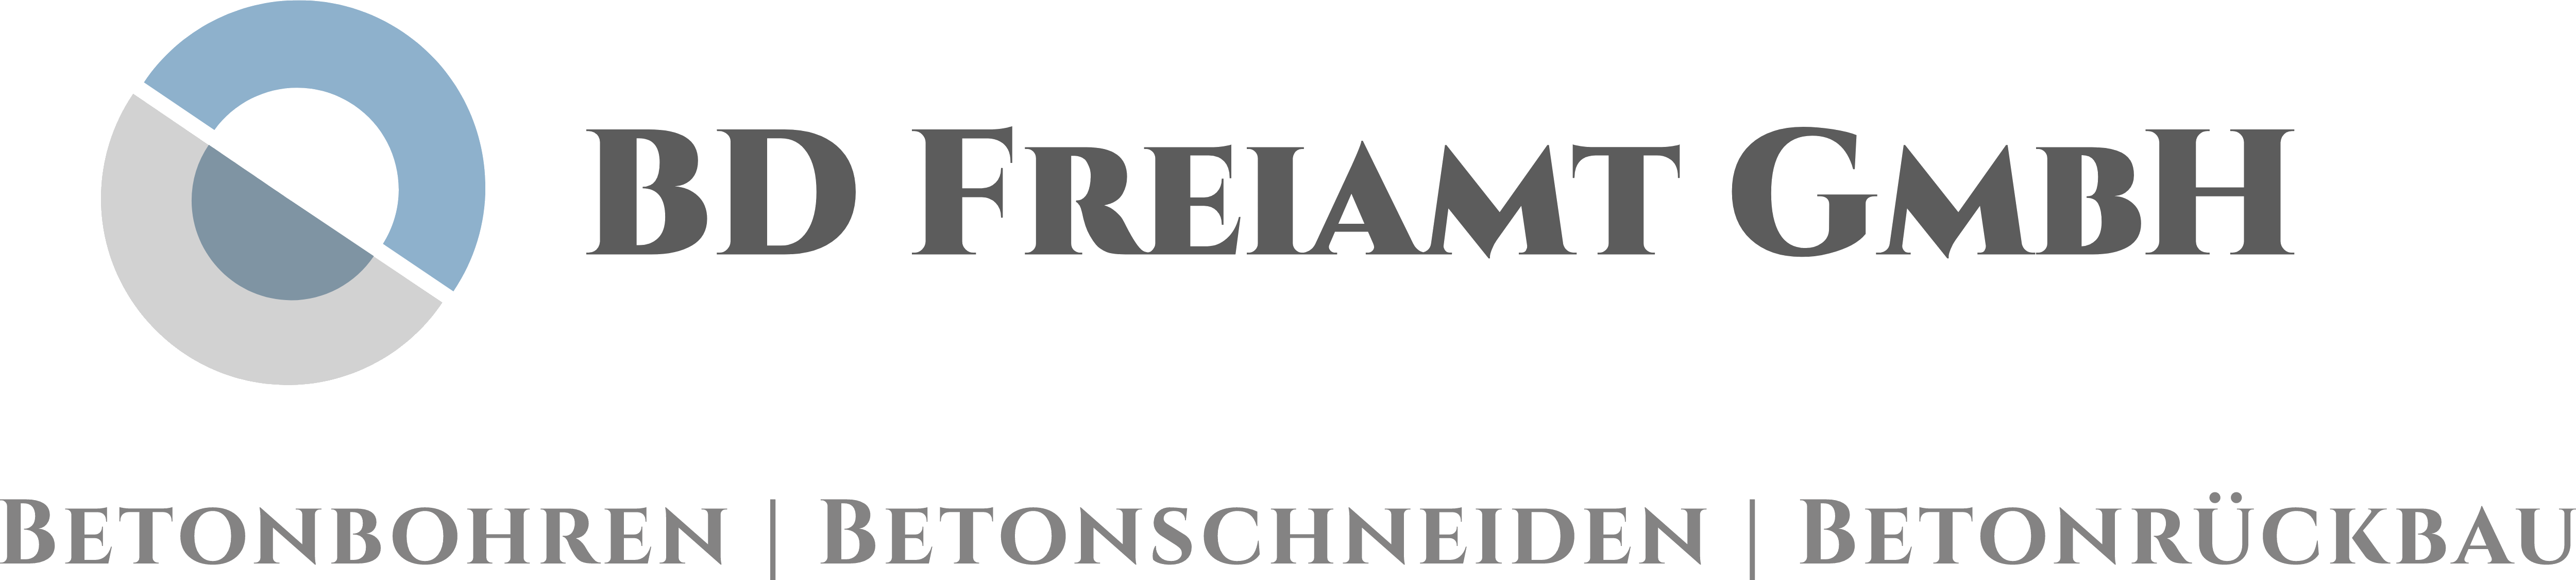 BD Freiamt GmbH